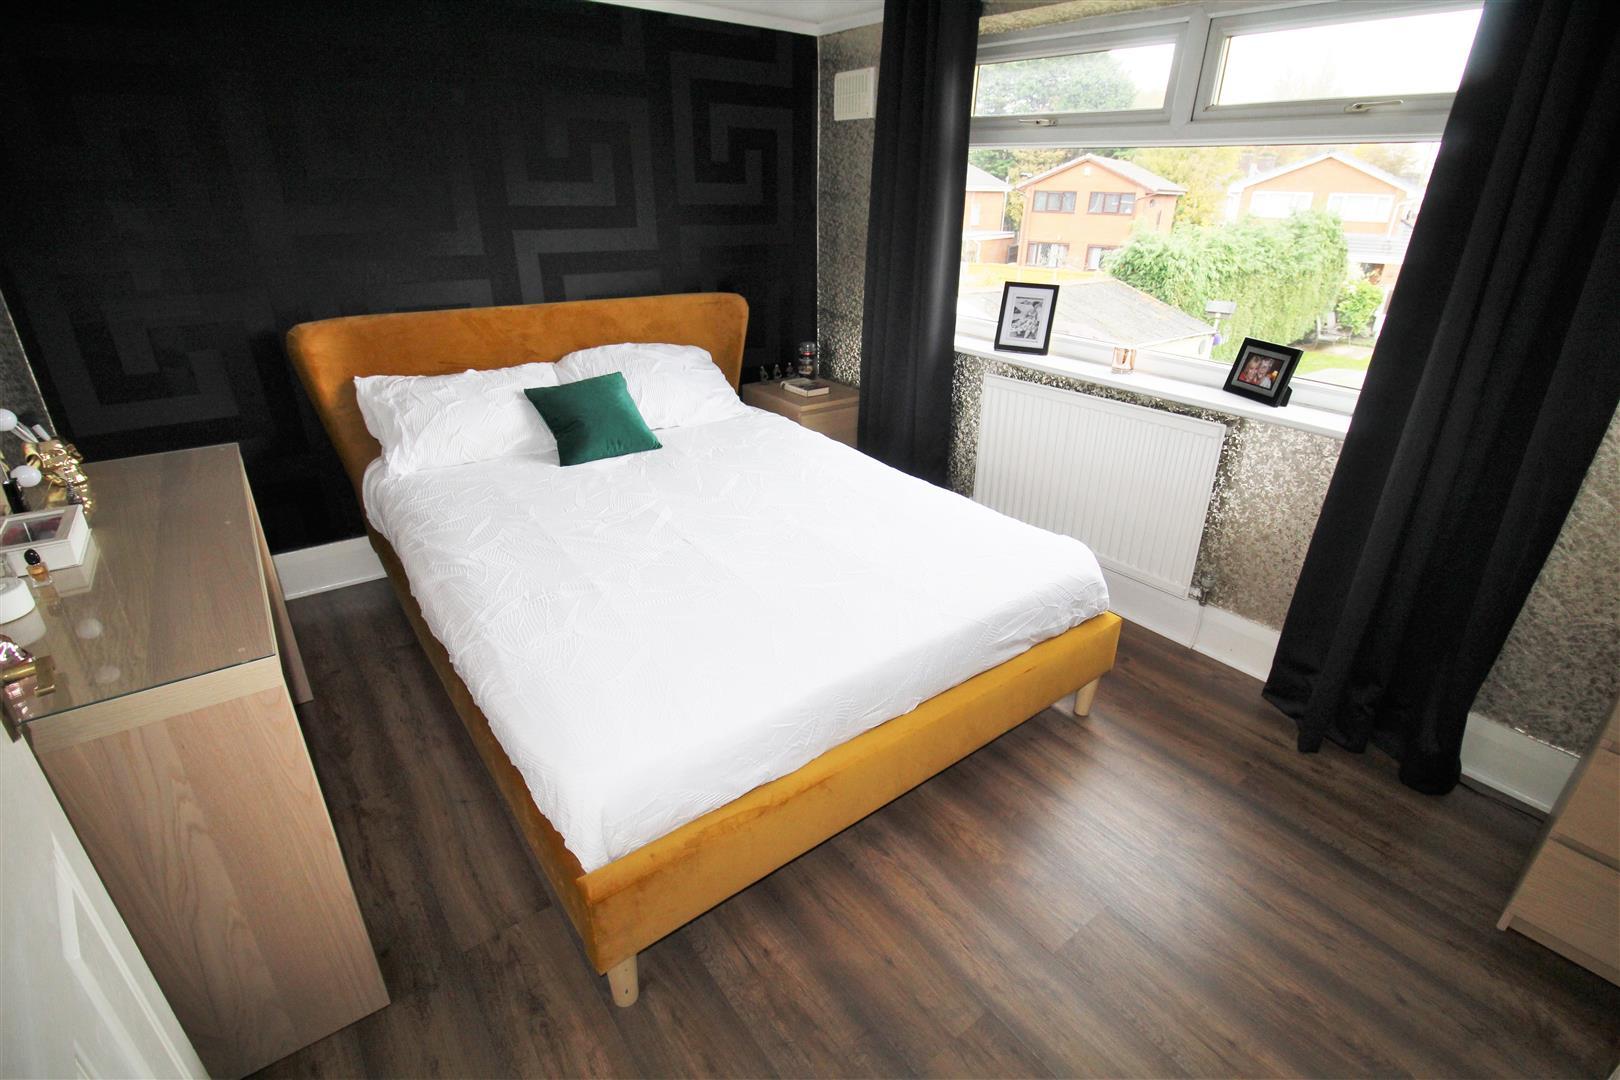 4 Bedrooms, House - Semi-Detached, Malvern Grove, Liverpool